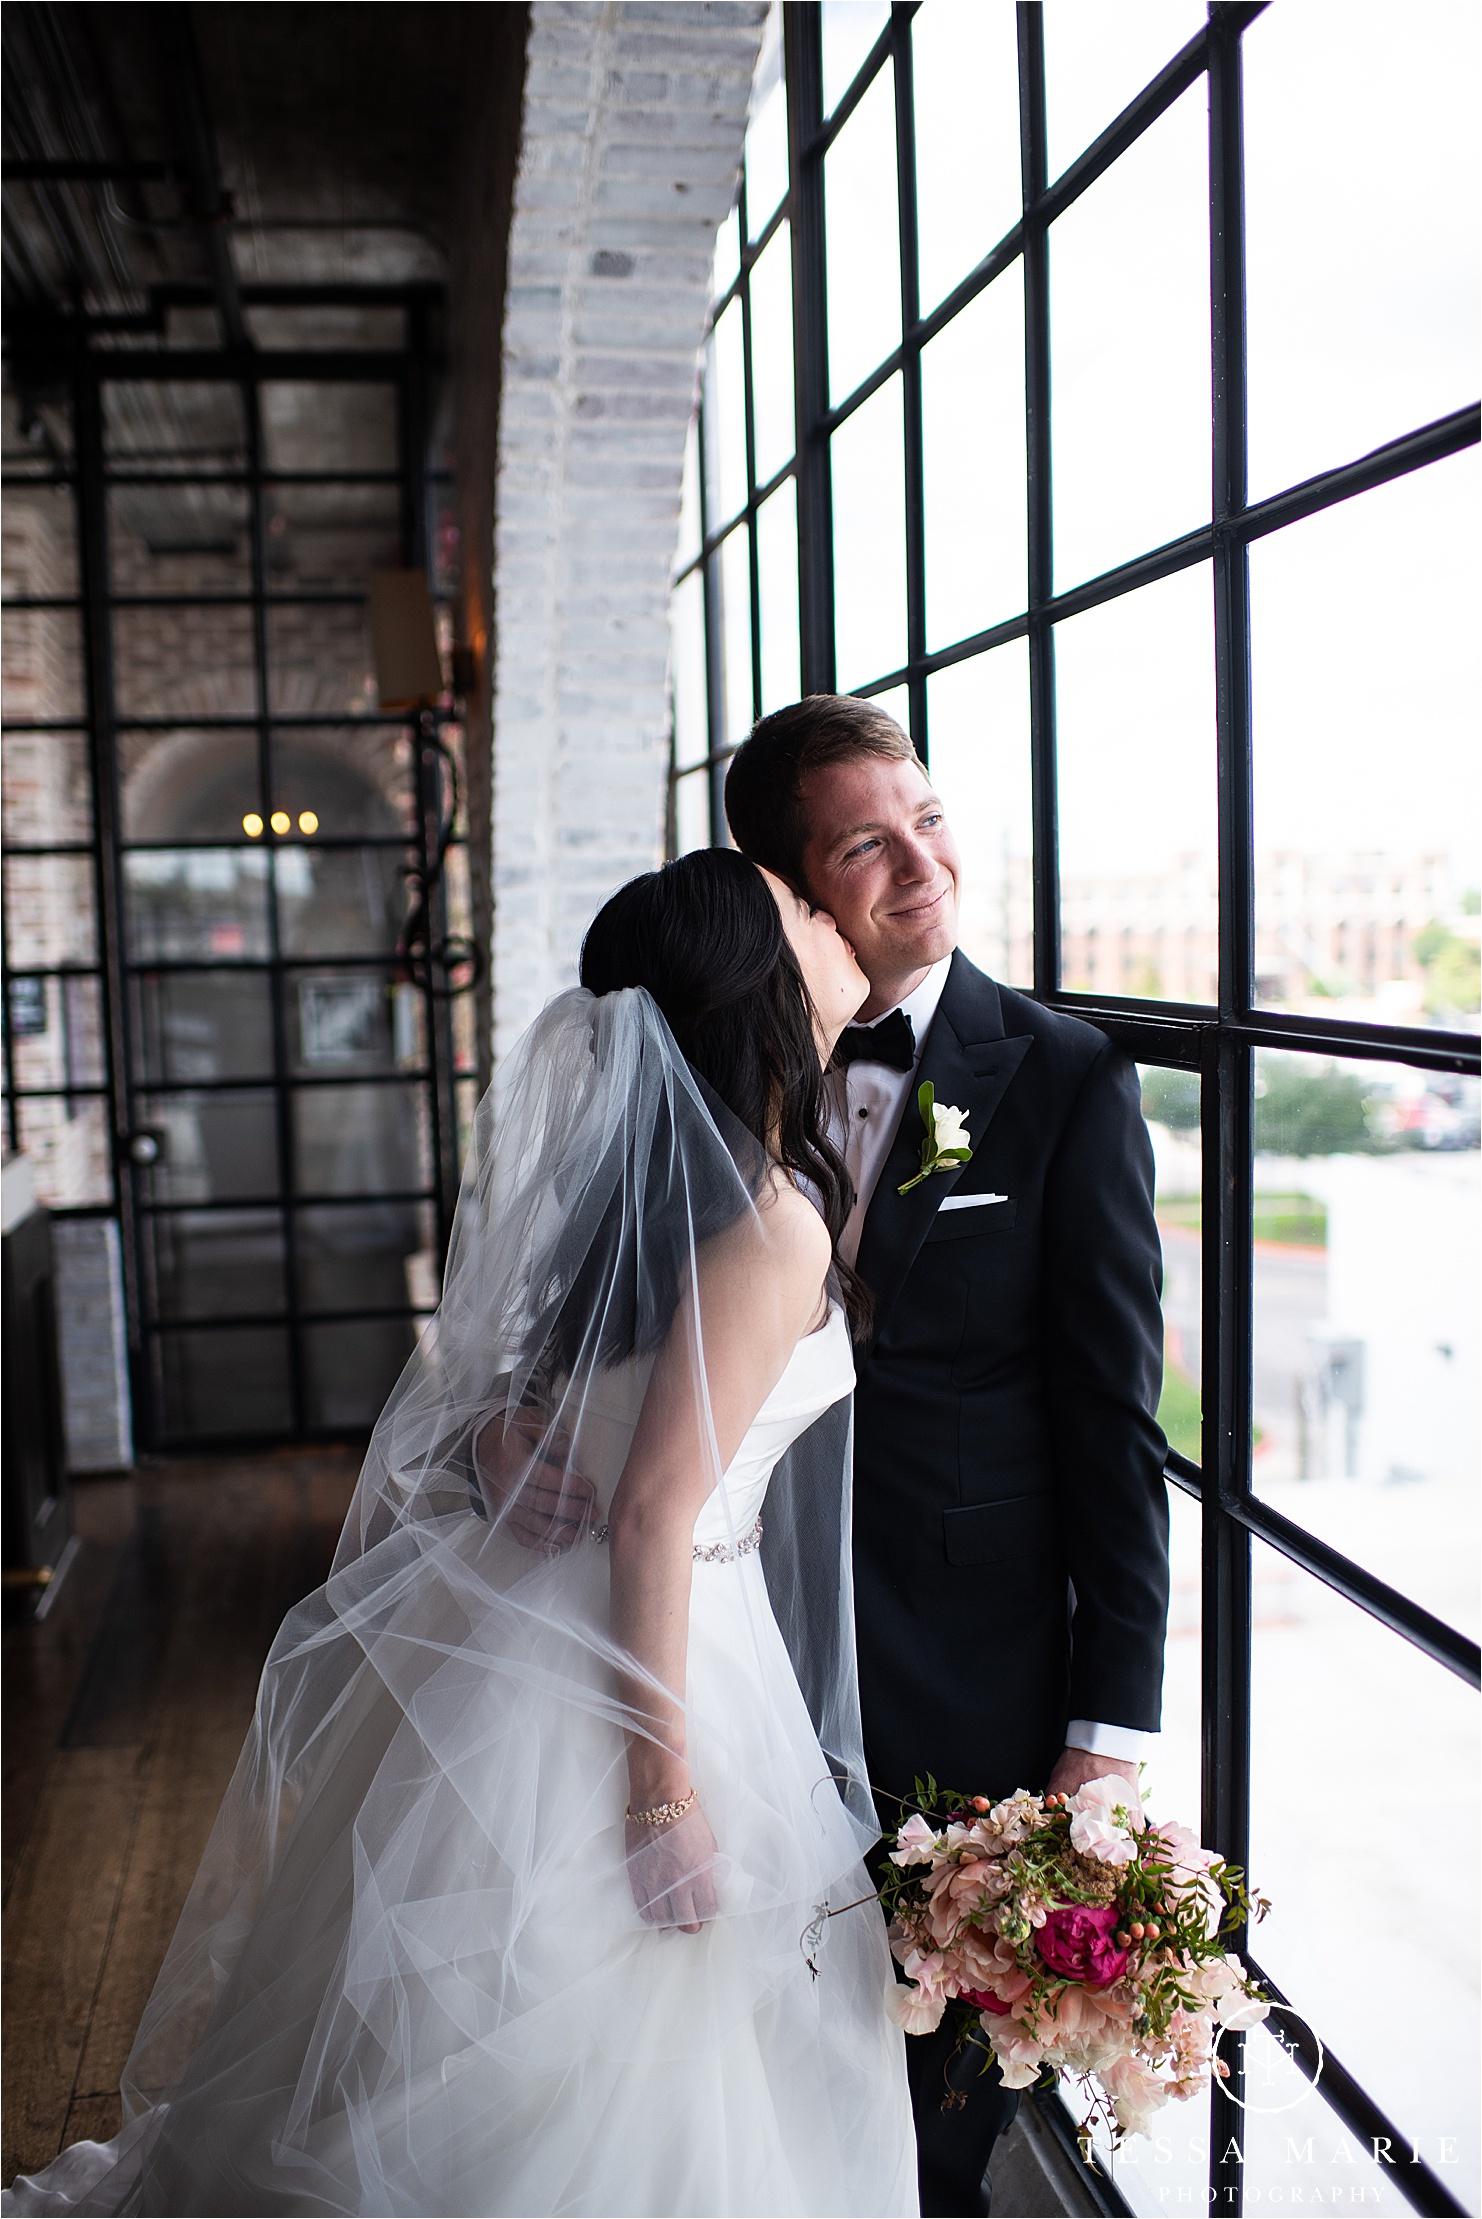 Tessa_marie_weddings_houston_wedding_photographer_The_astorian_0065.jpg